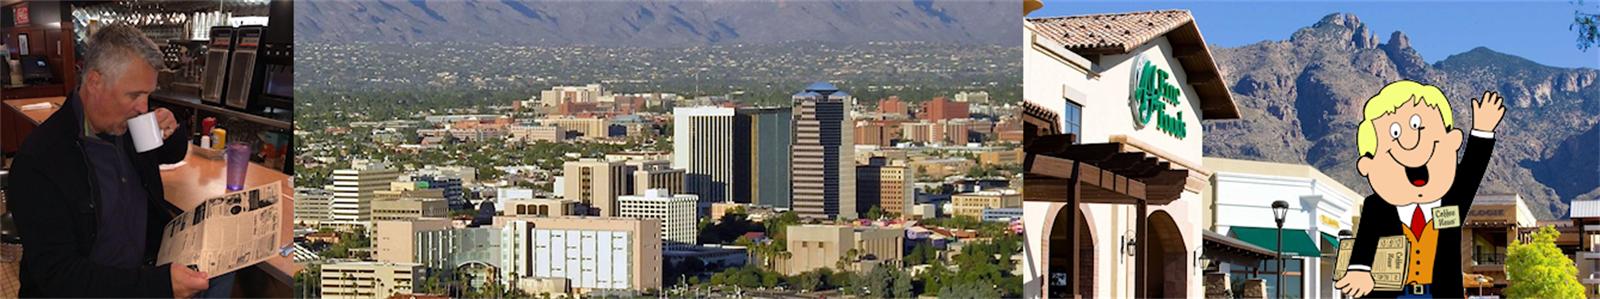 Welcome to Coffee News® Tucson, Arizona